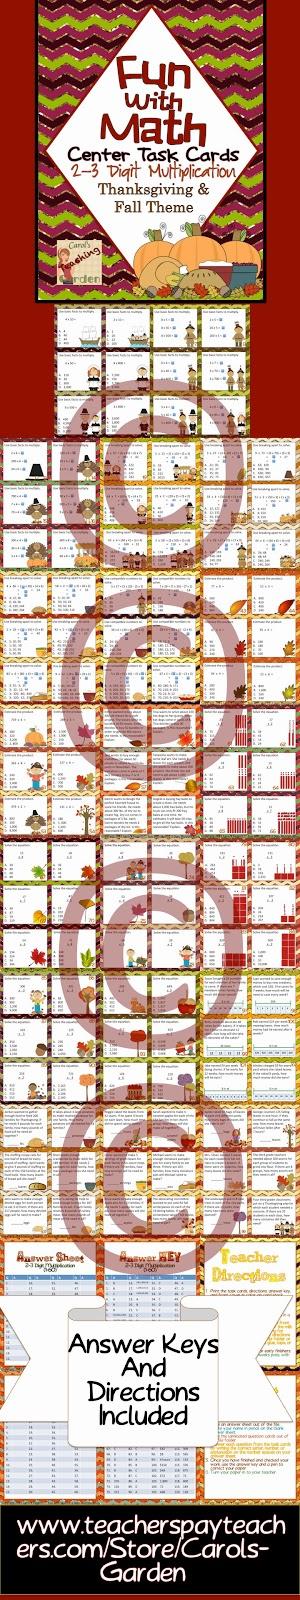 http://www.teacherspayteachers.com/Product/Fun-With-Math-Center-Task-Cards-2-3-Digit-Multiplication-937598